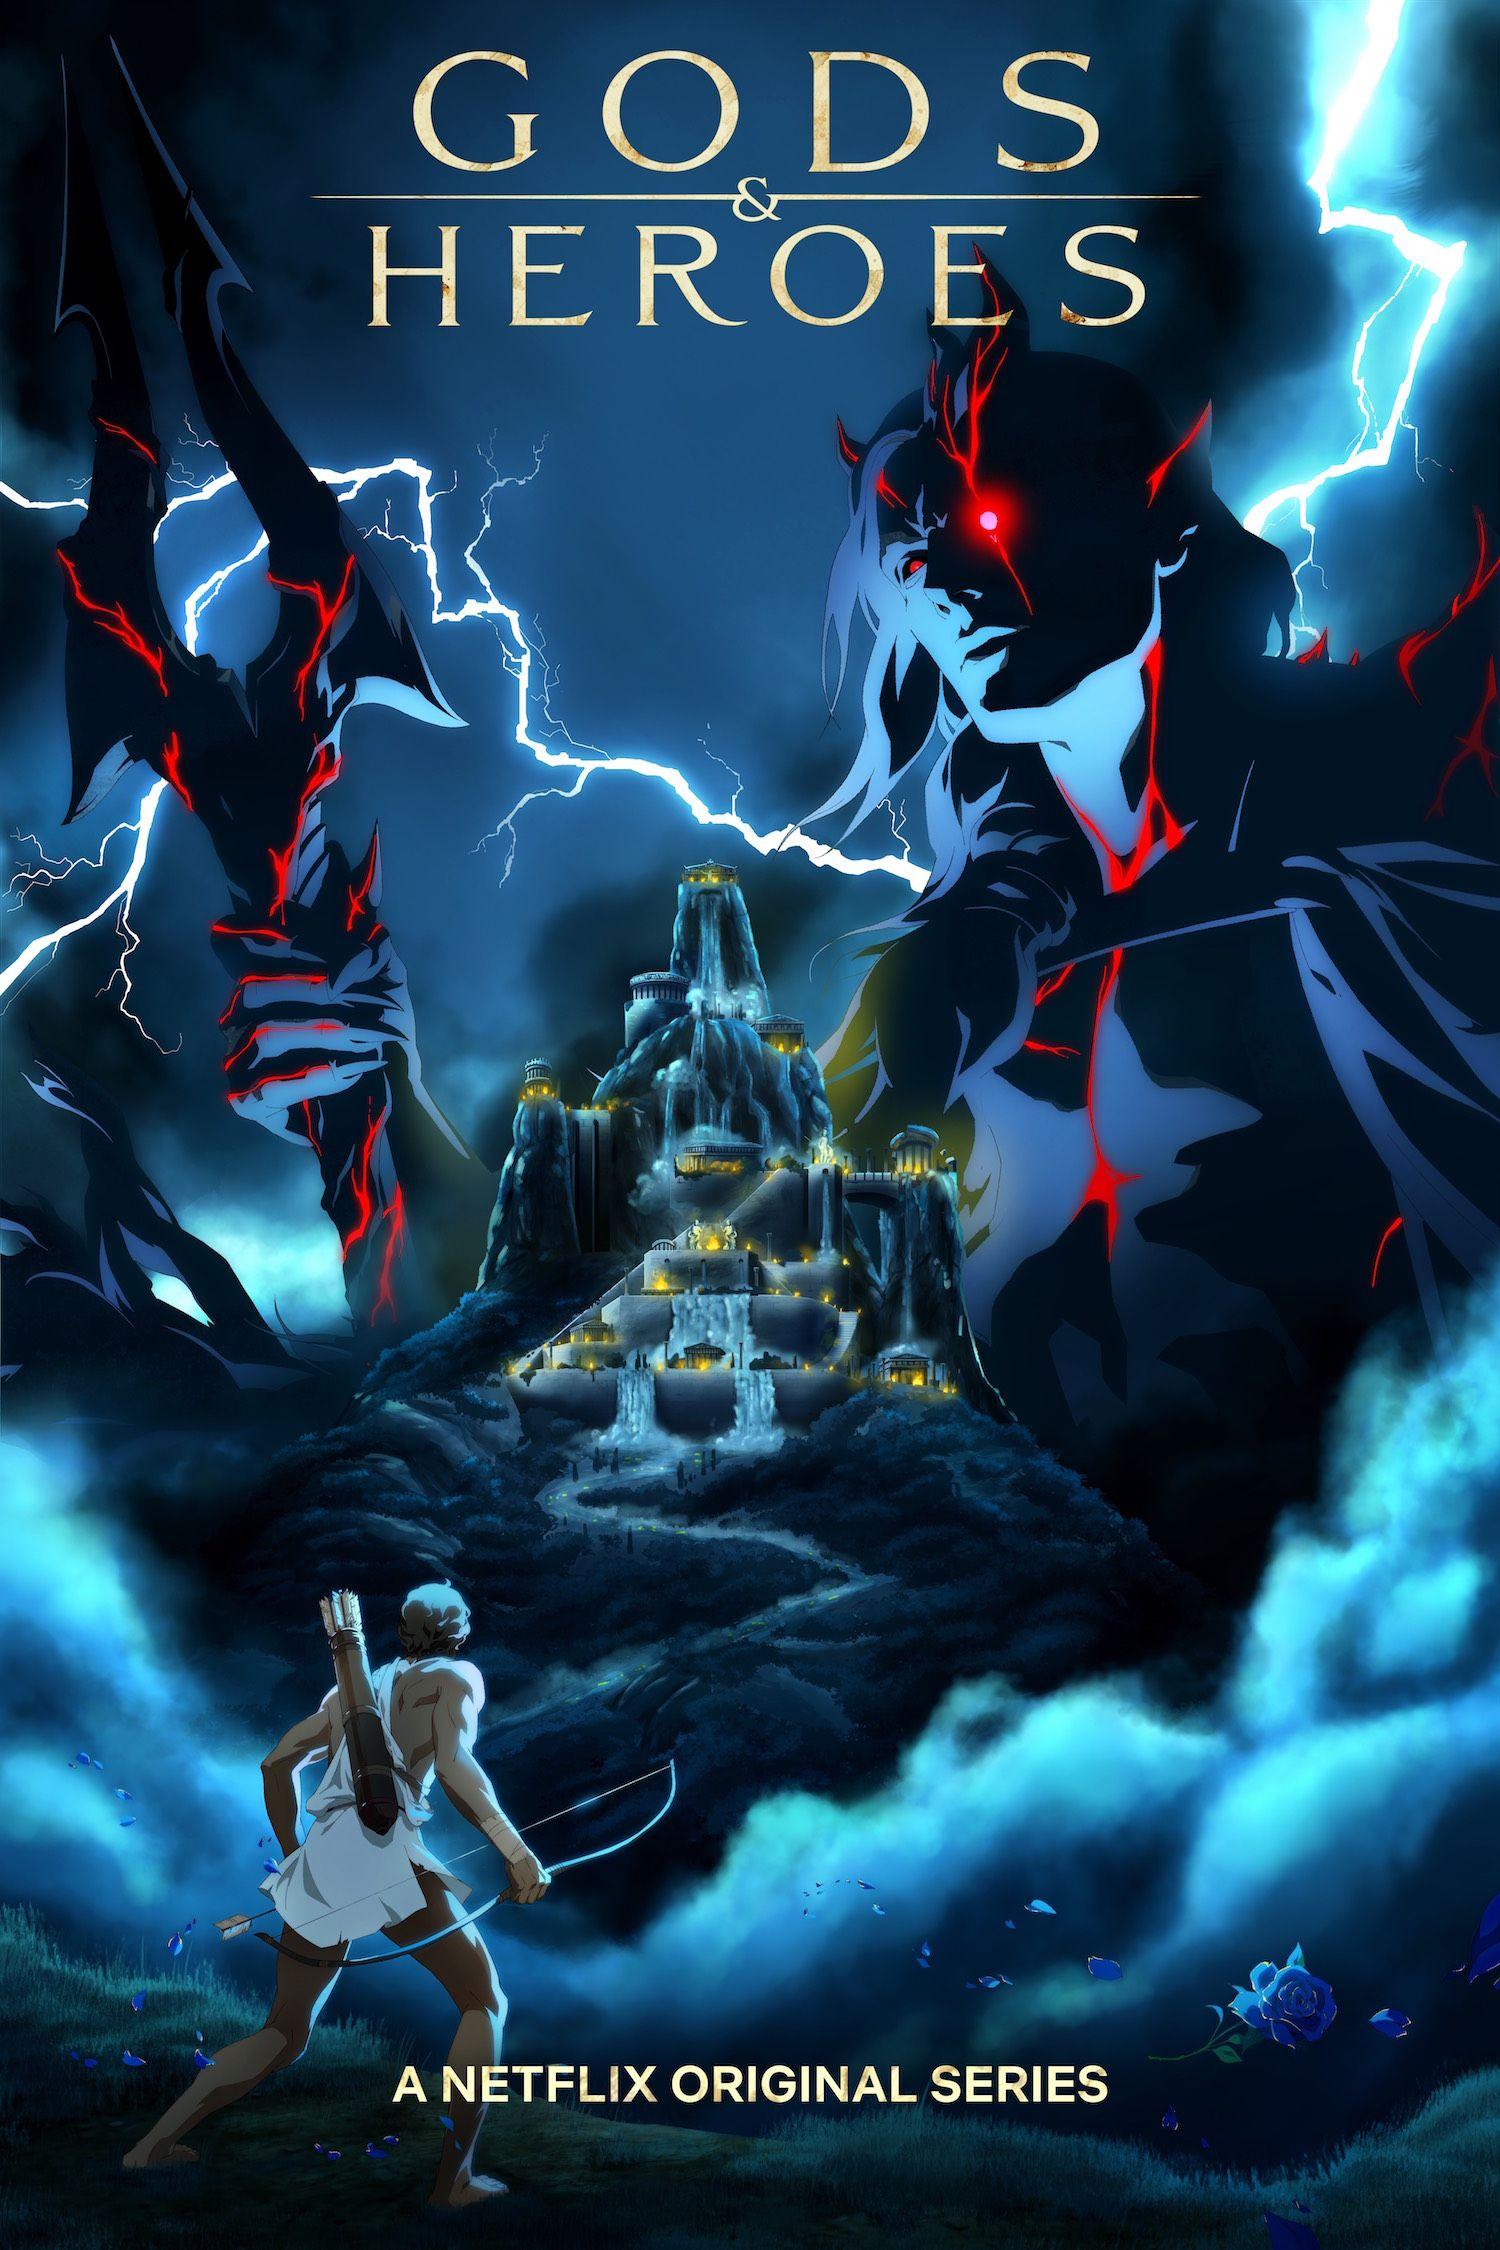 Netflix is Producing a Greek Mythology Anime Series Called